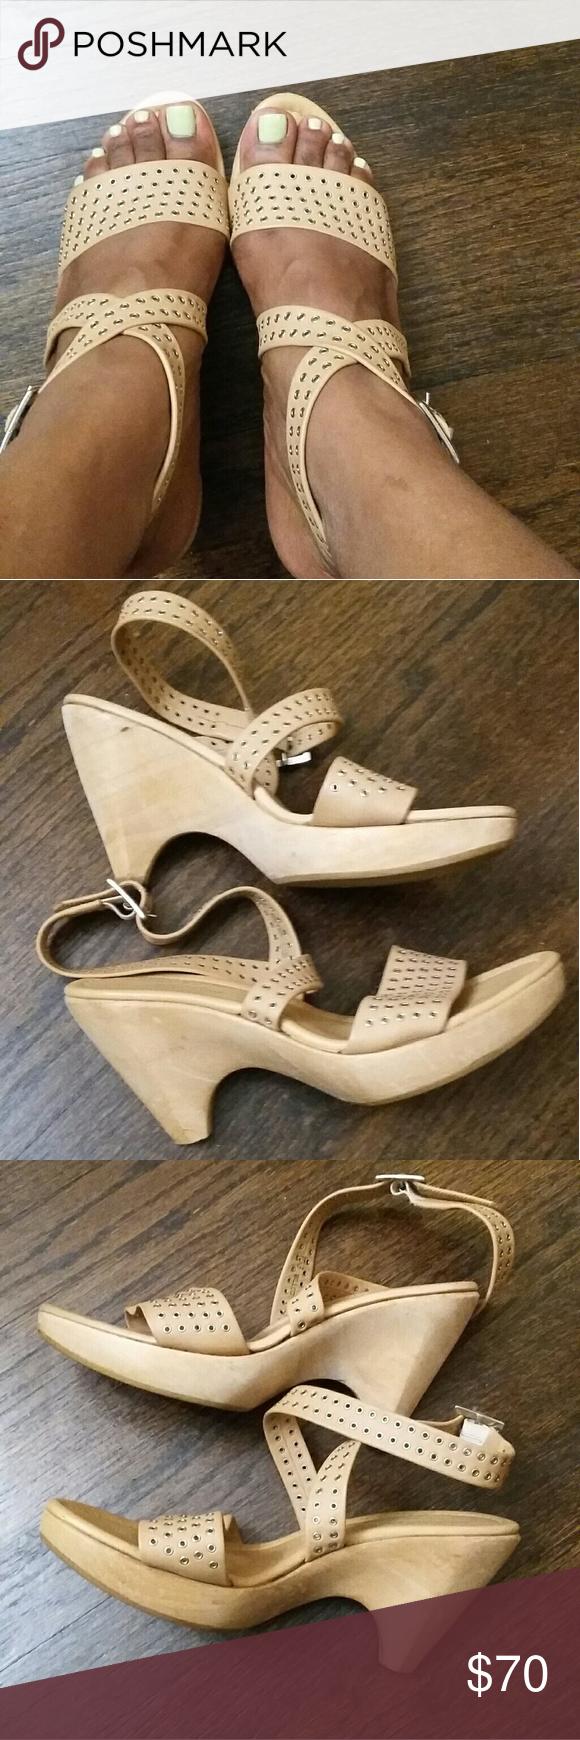 c40d33126644 Women s Phree Flat Sandal